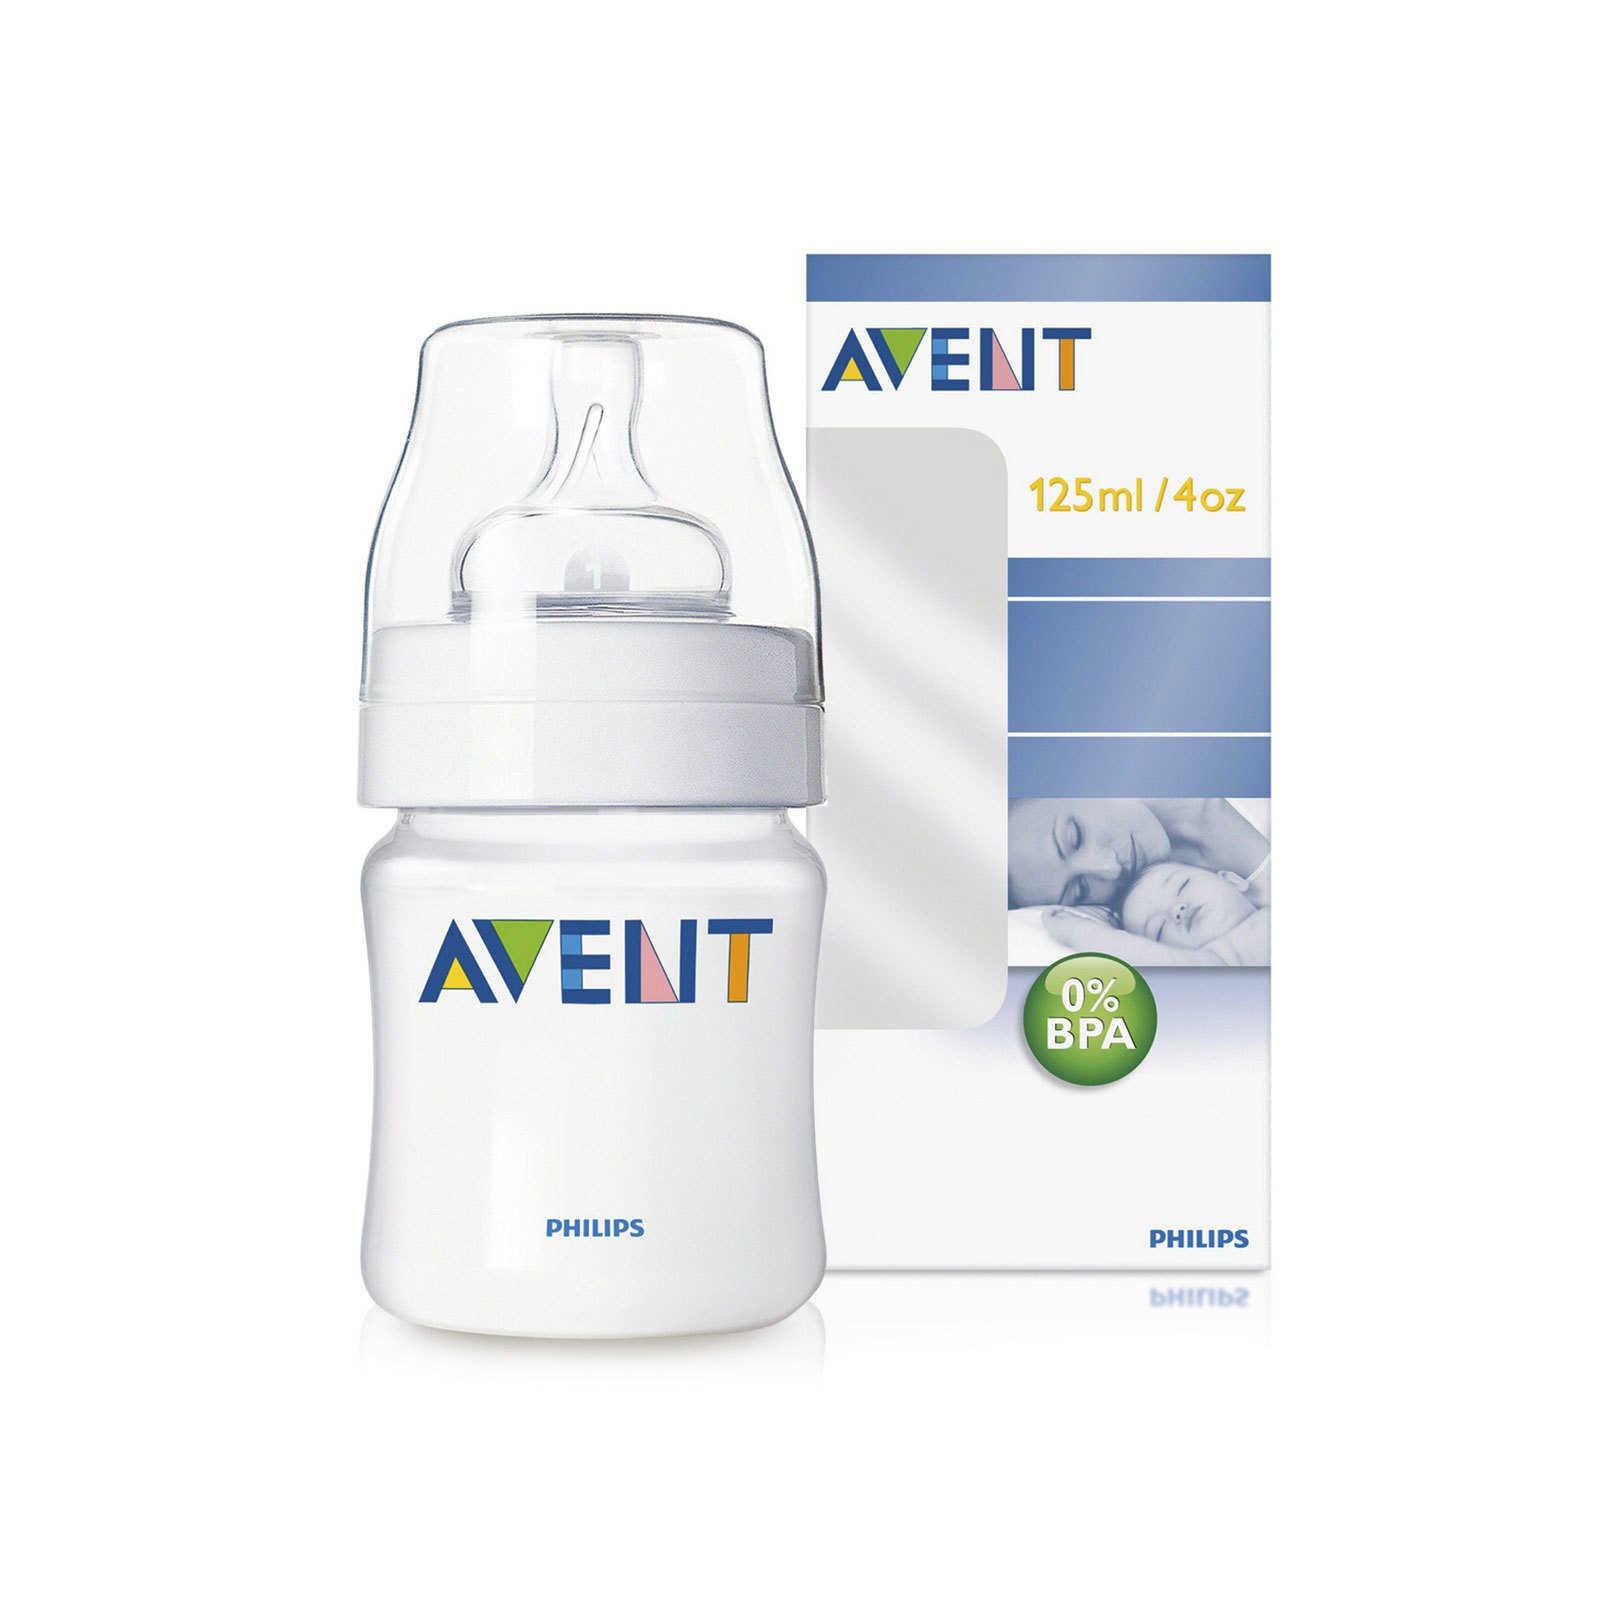 Avent - Airflex - 125 ml.